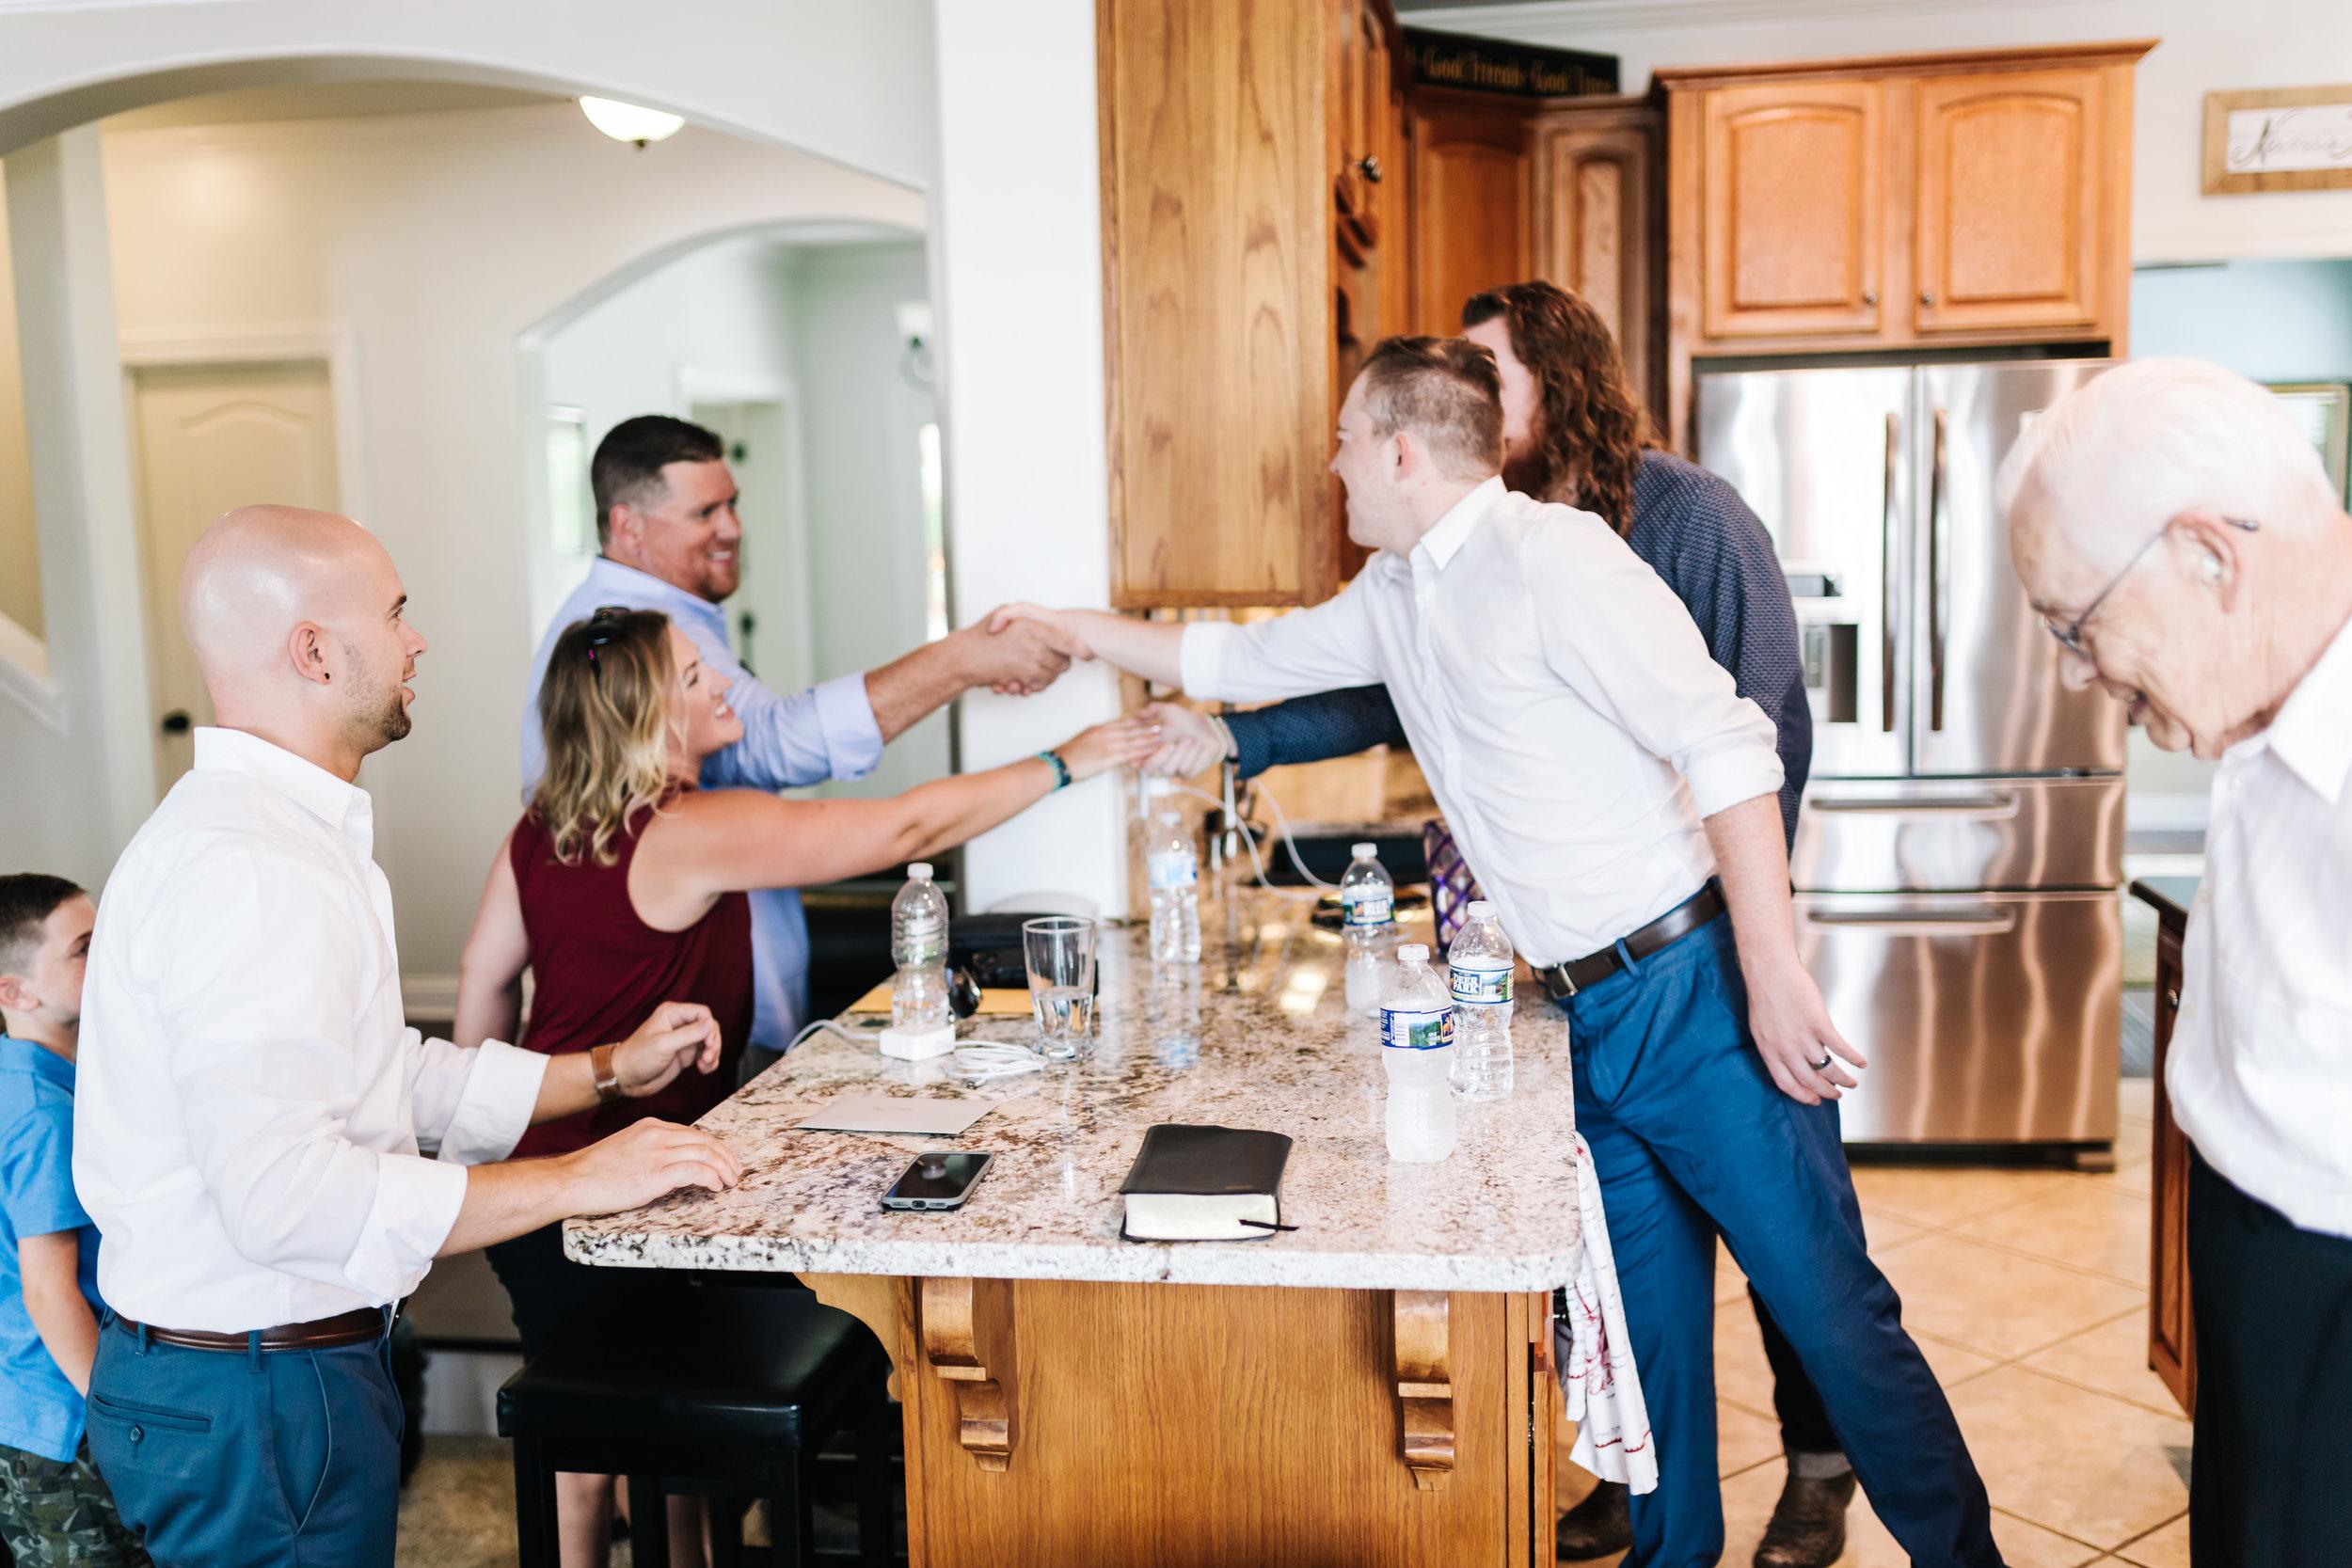 2018.09.02 Ray and Sarah Prizner Nashville TN Wedding FINALS-215.jpg